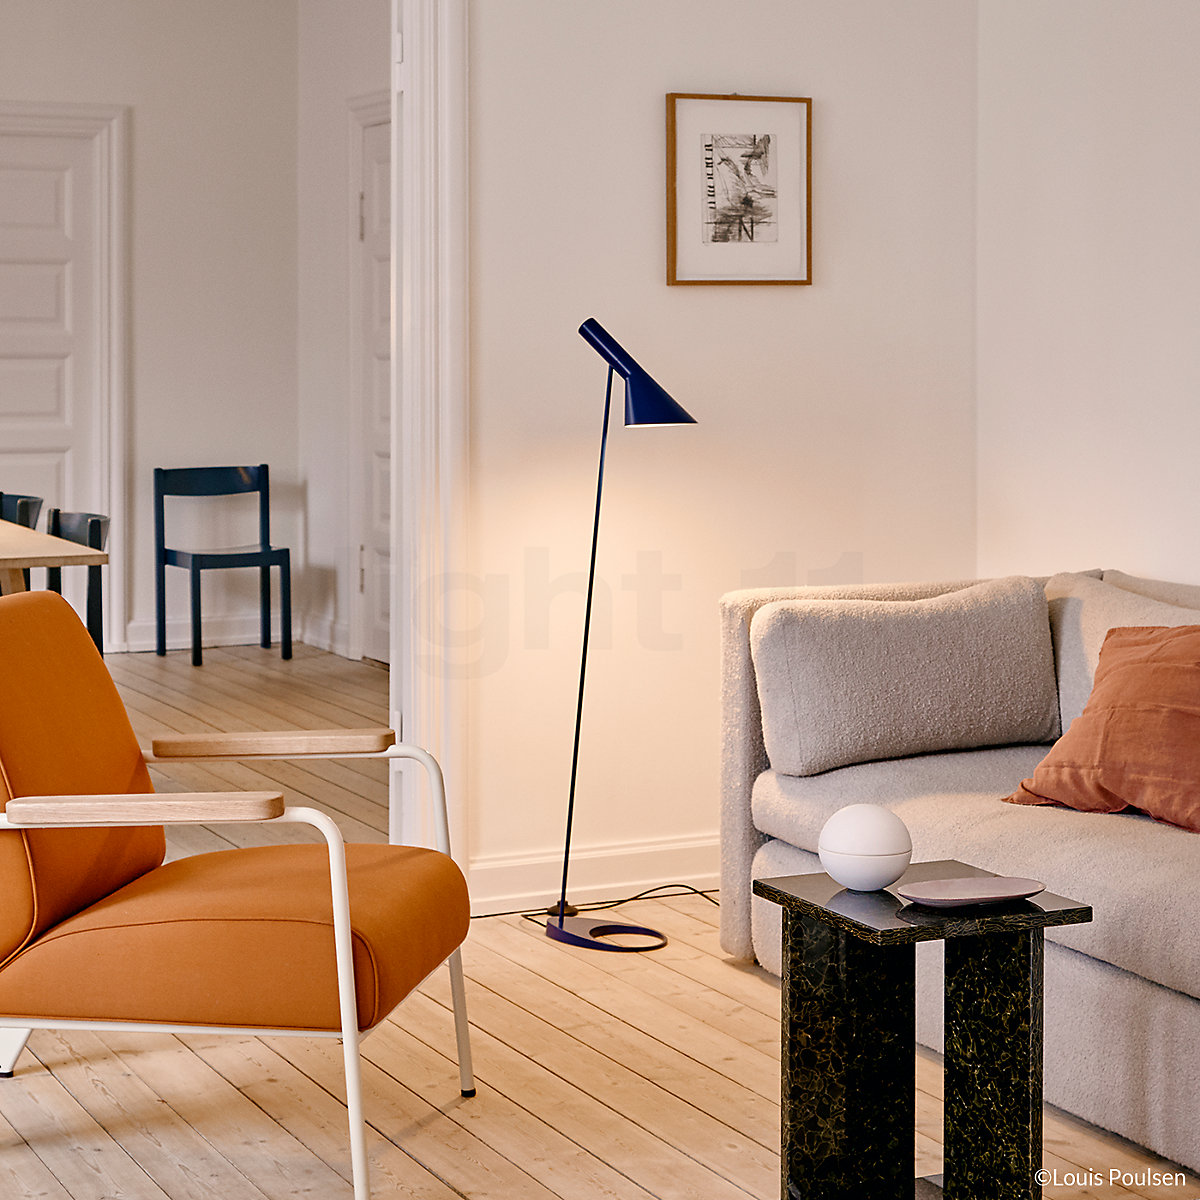 Buy Louis Poulsen Aj Floor Lamp At Light11 Eu